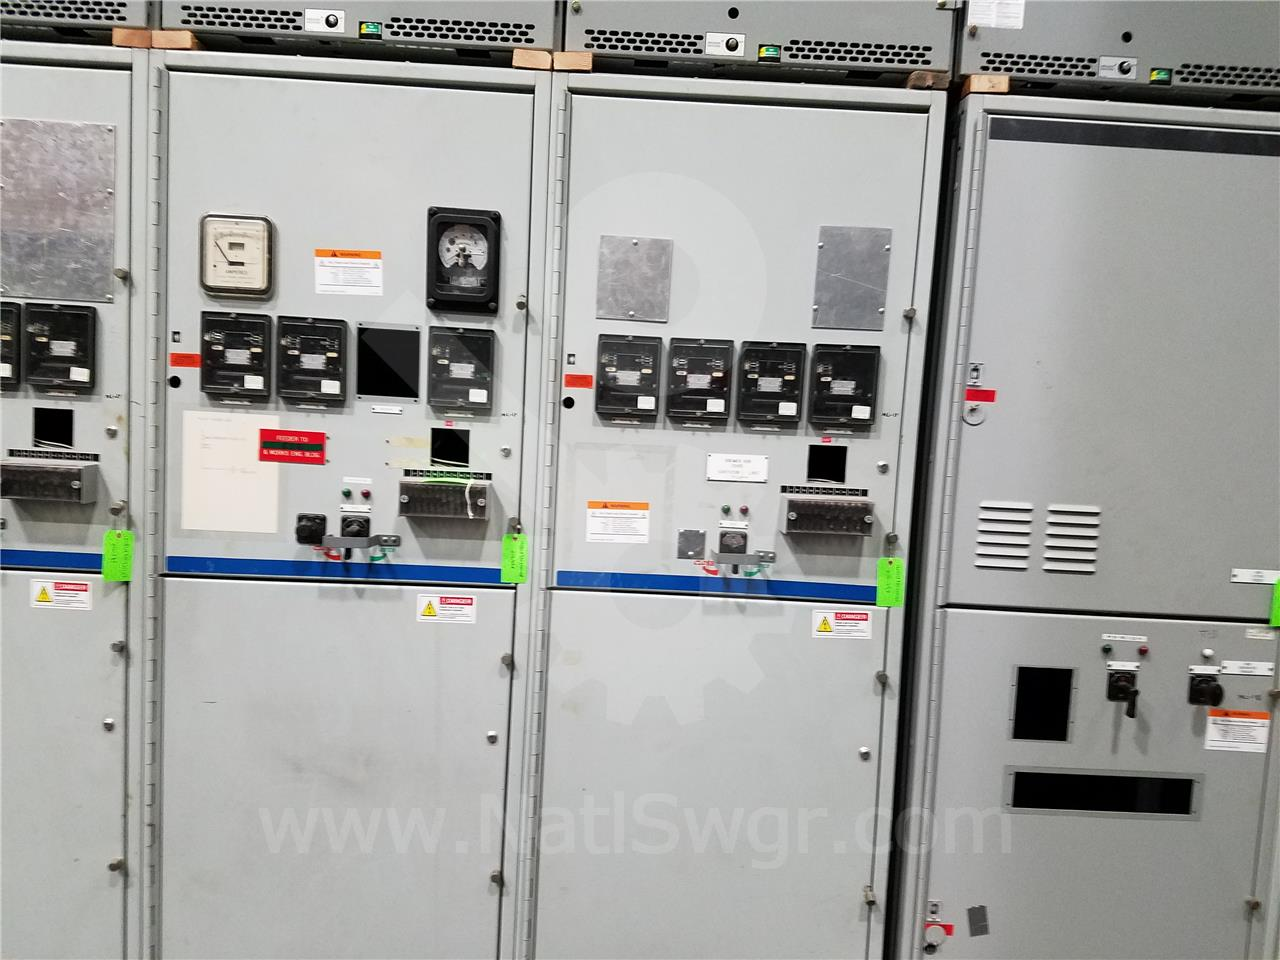 15KV GE / General Electric VB/VB1 INDOOR SWITCHGEAR 2-1200A  BREAKER COMPARTMENT, 125VDC CONTROL